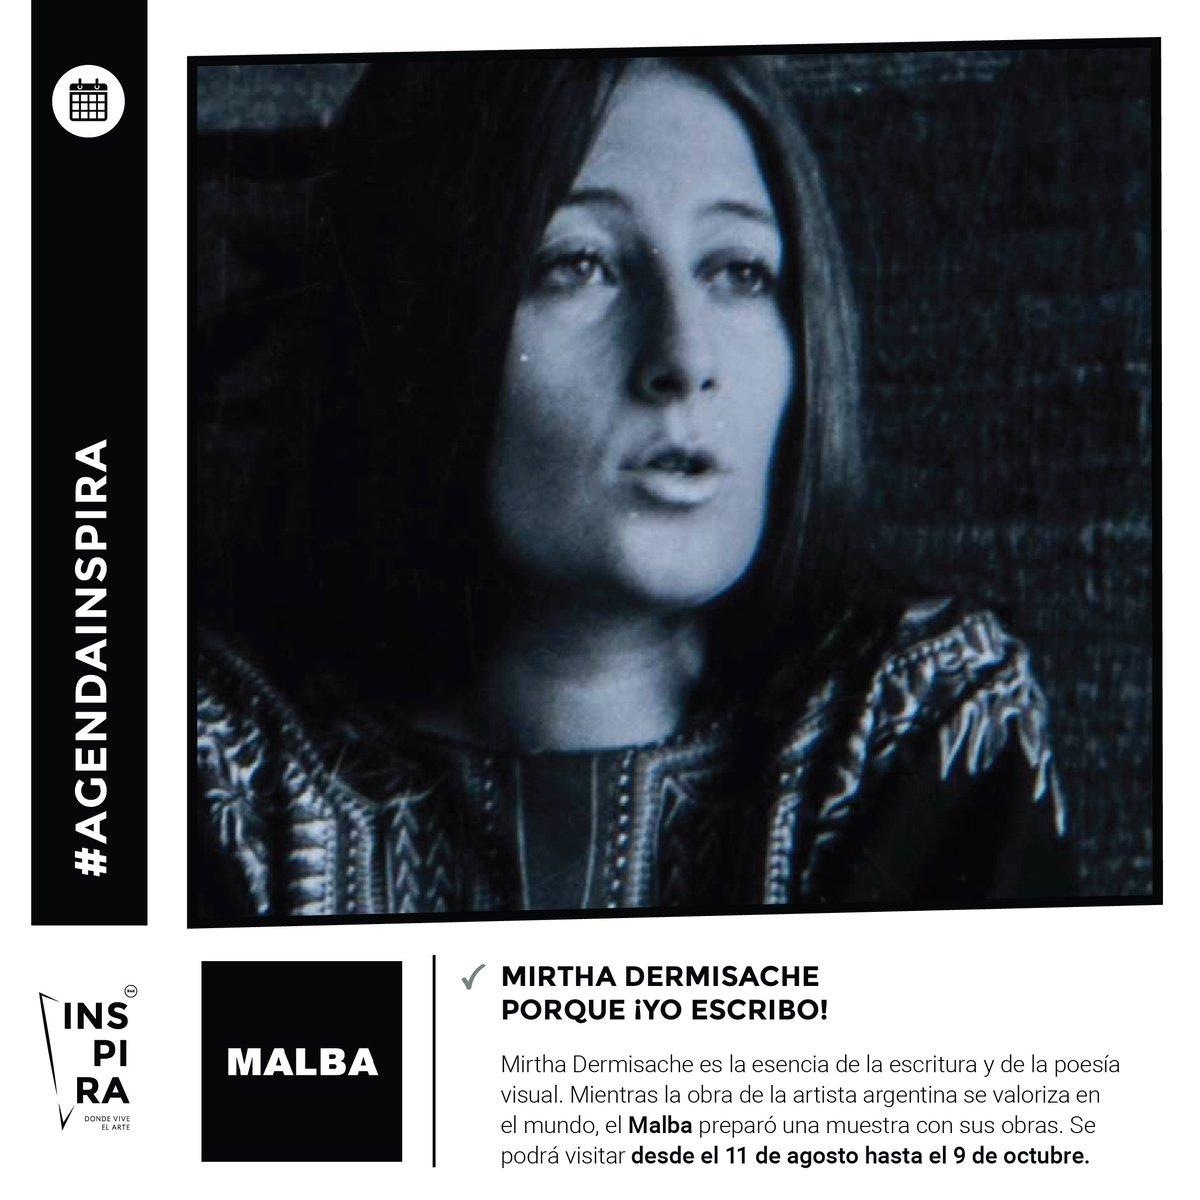 #AgendaInspiraMirtha Dermisache hoy en @museomalba #RedInspira #dondeviveelarte #artelatinoamericano #MirthaDermisache #arte #museo #artista